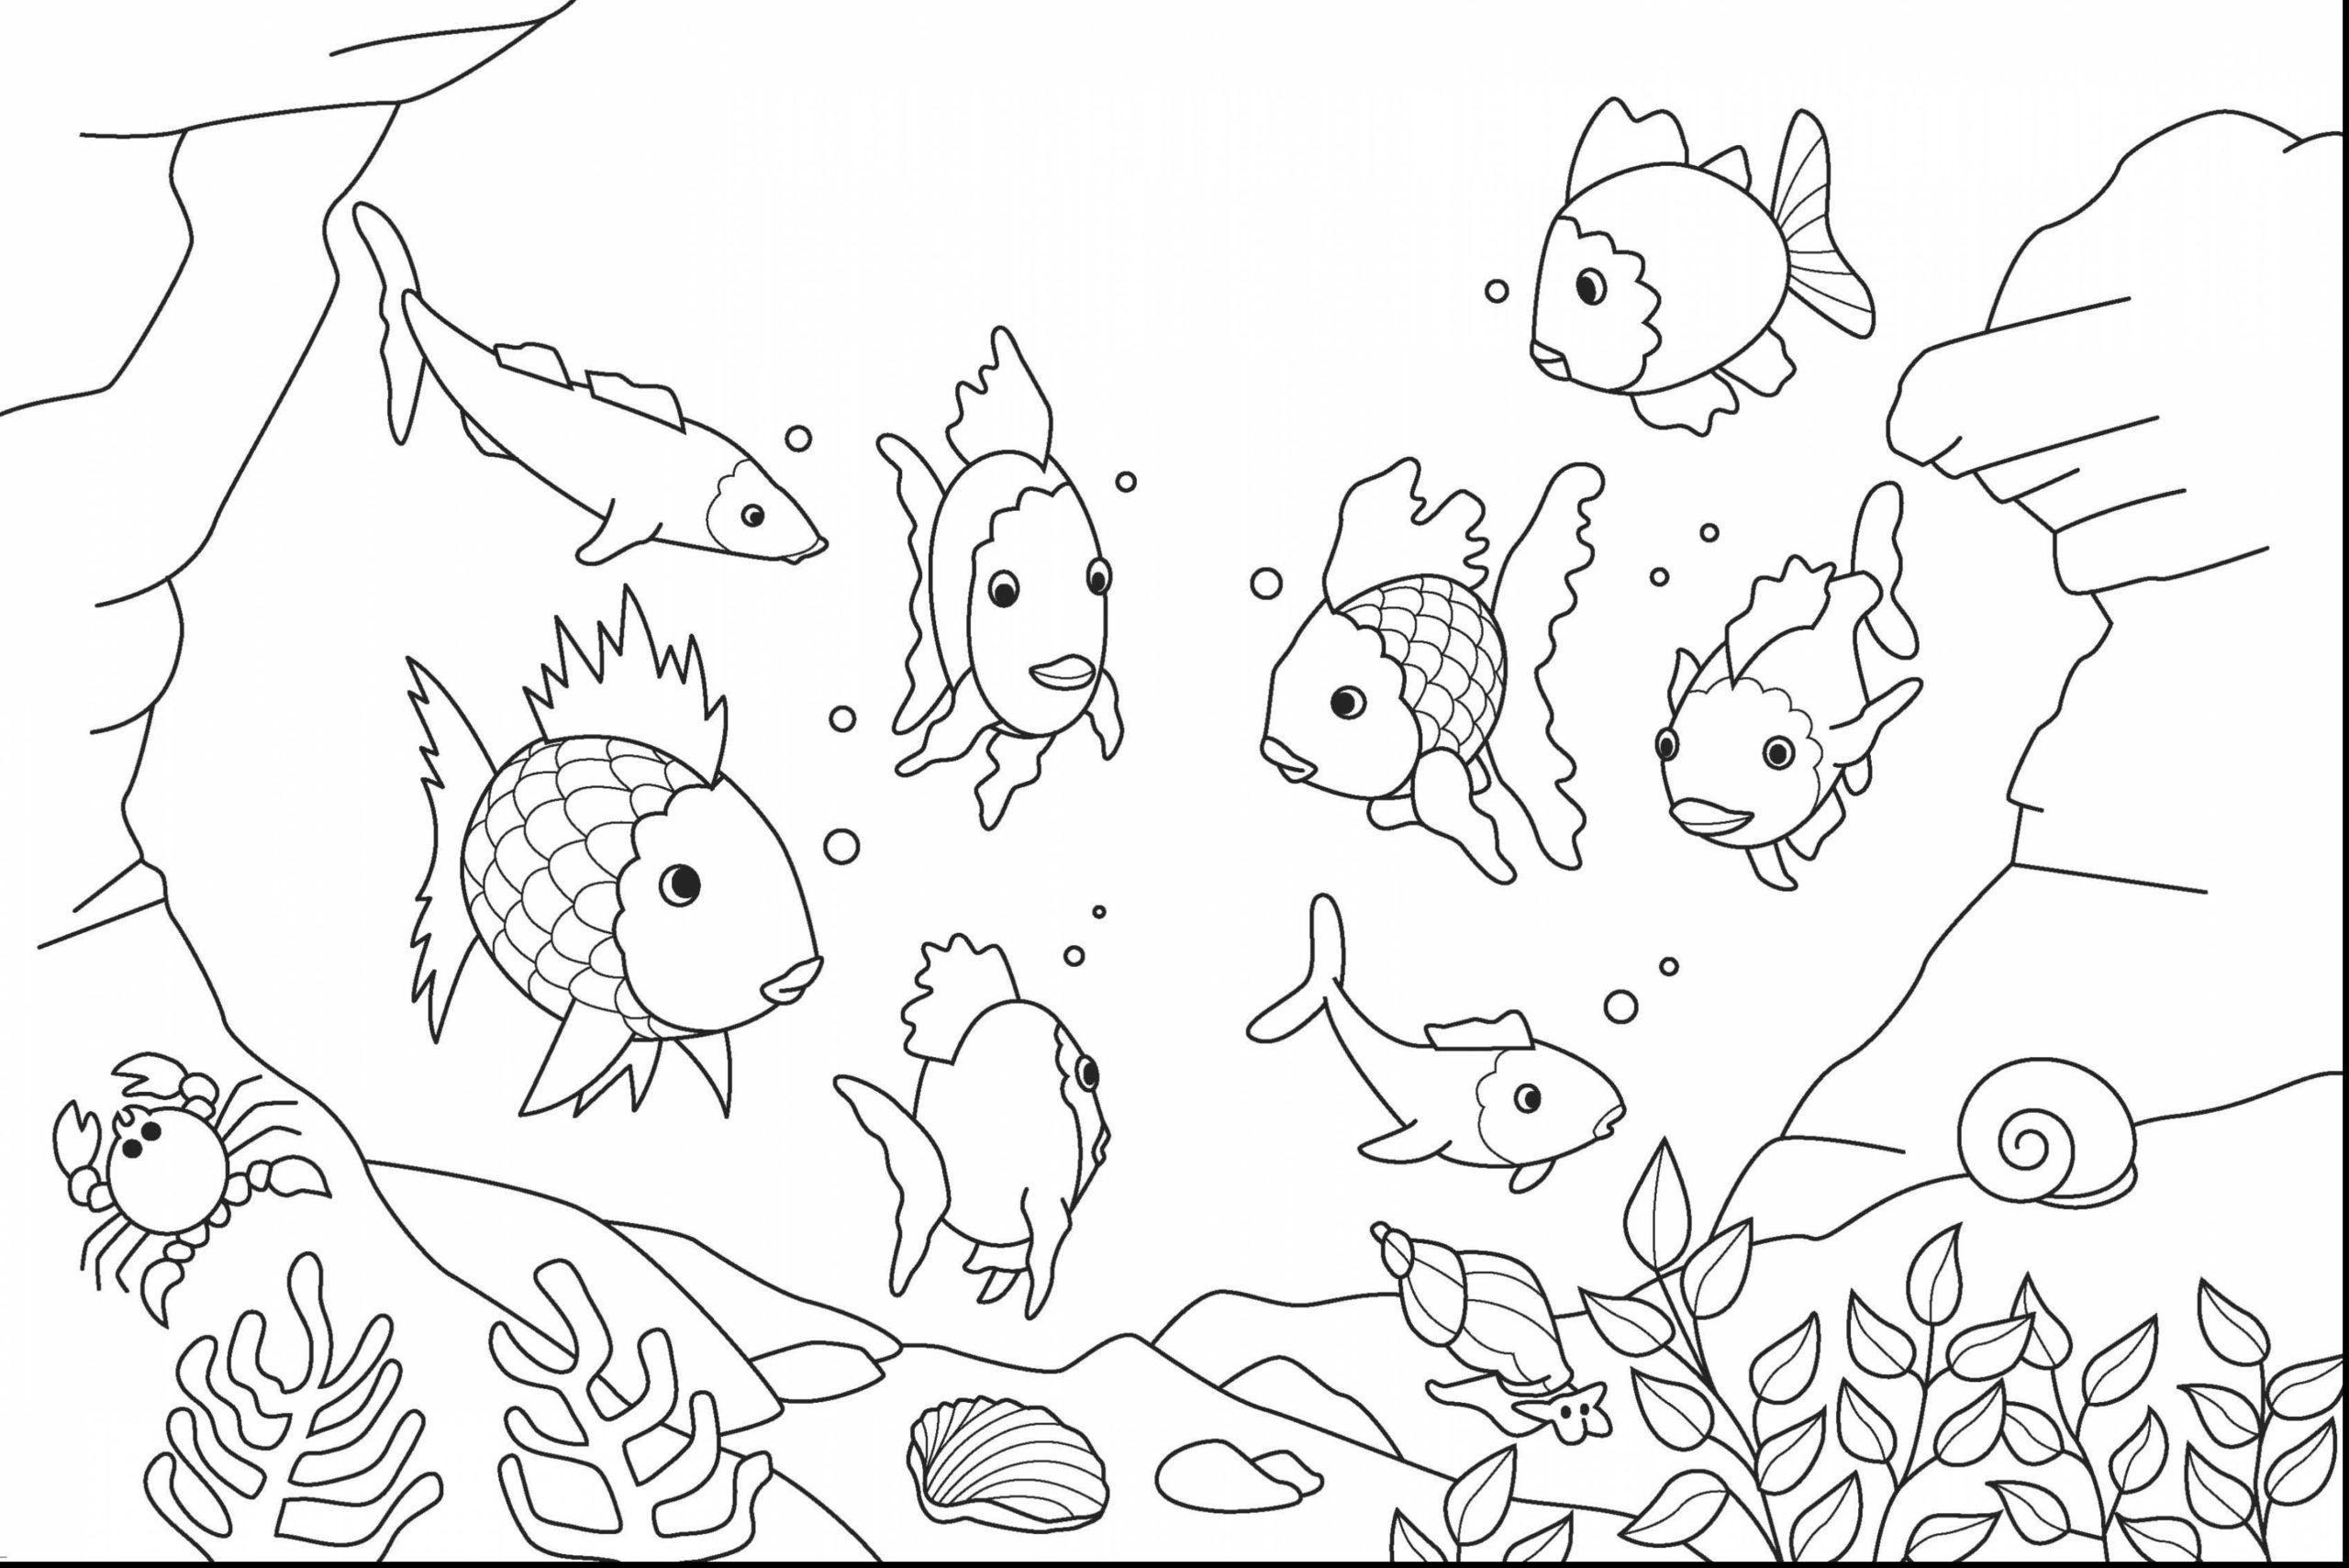 38 Coloring Page Under The Sea Ocean Coloring Pages Rainbow Fish Coloring Page Animal Coloring Pages